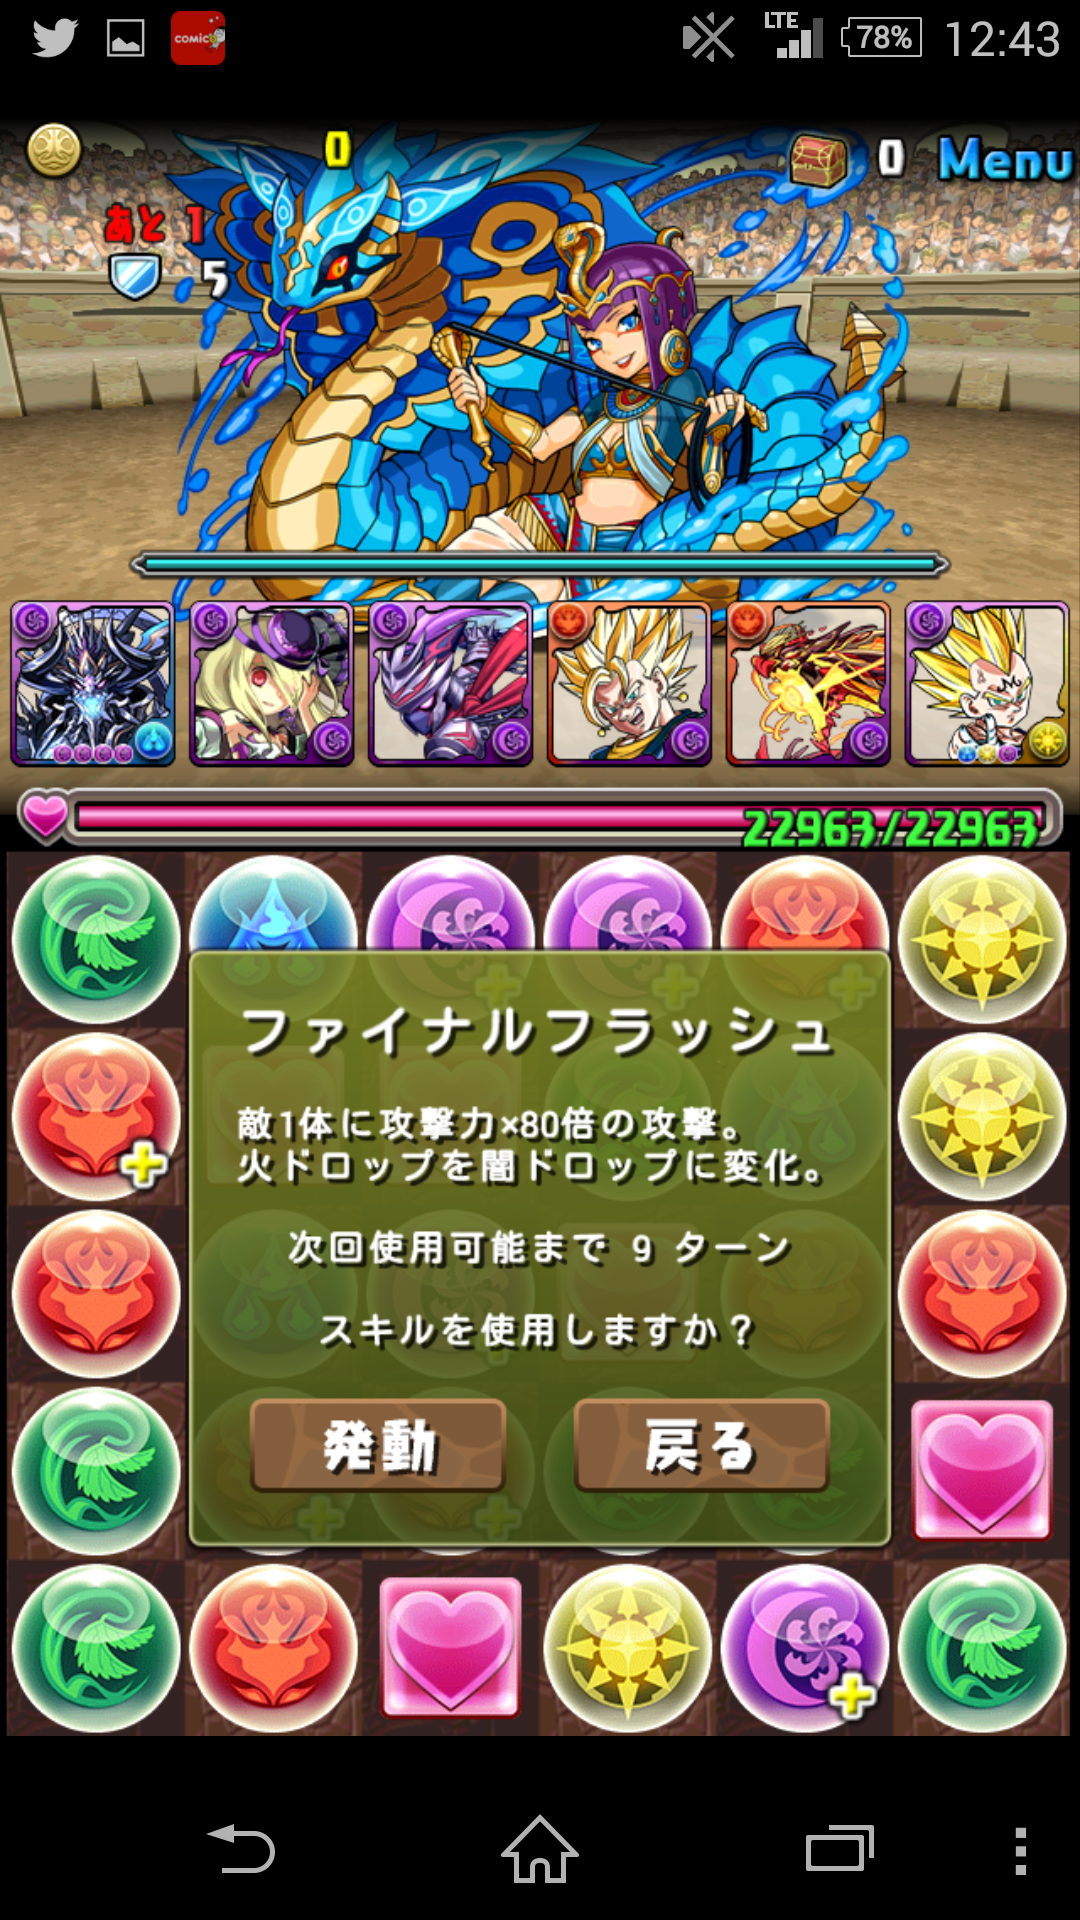 Screenshot_2015-06-19-12-43-22.png